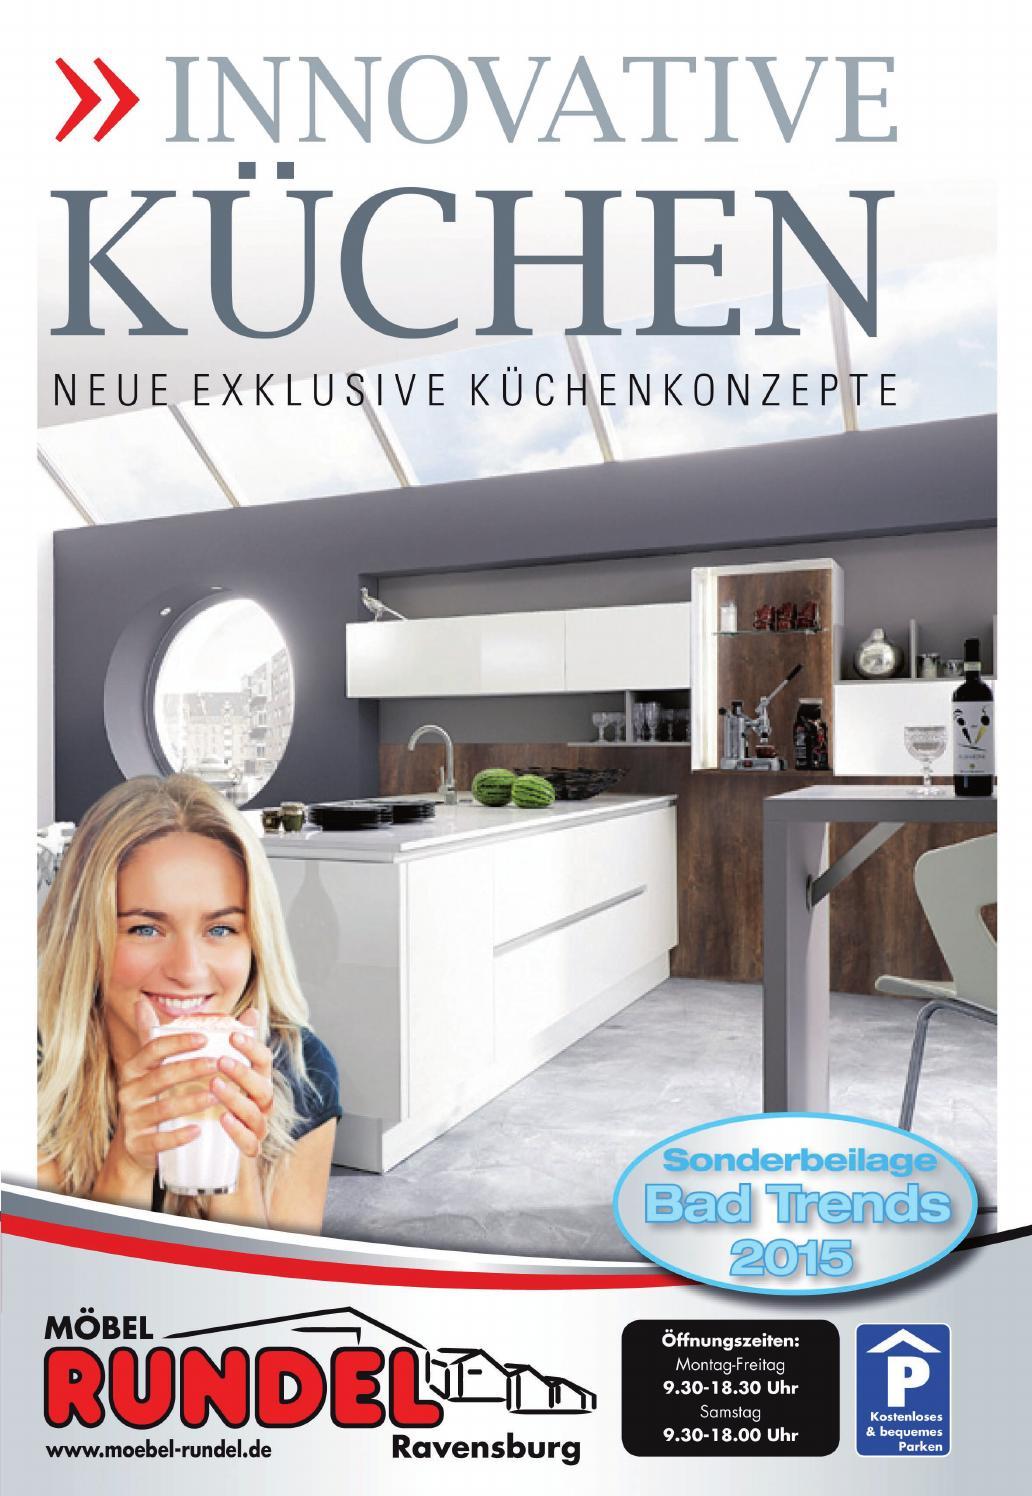 Moebel rundel kw10 by Russmedia Digital GmbH - issuu